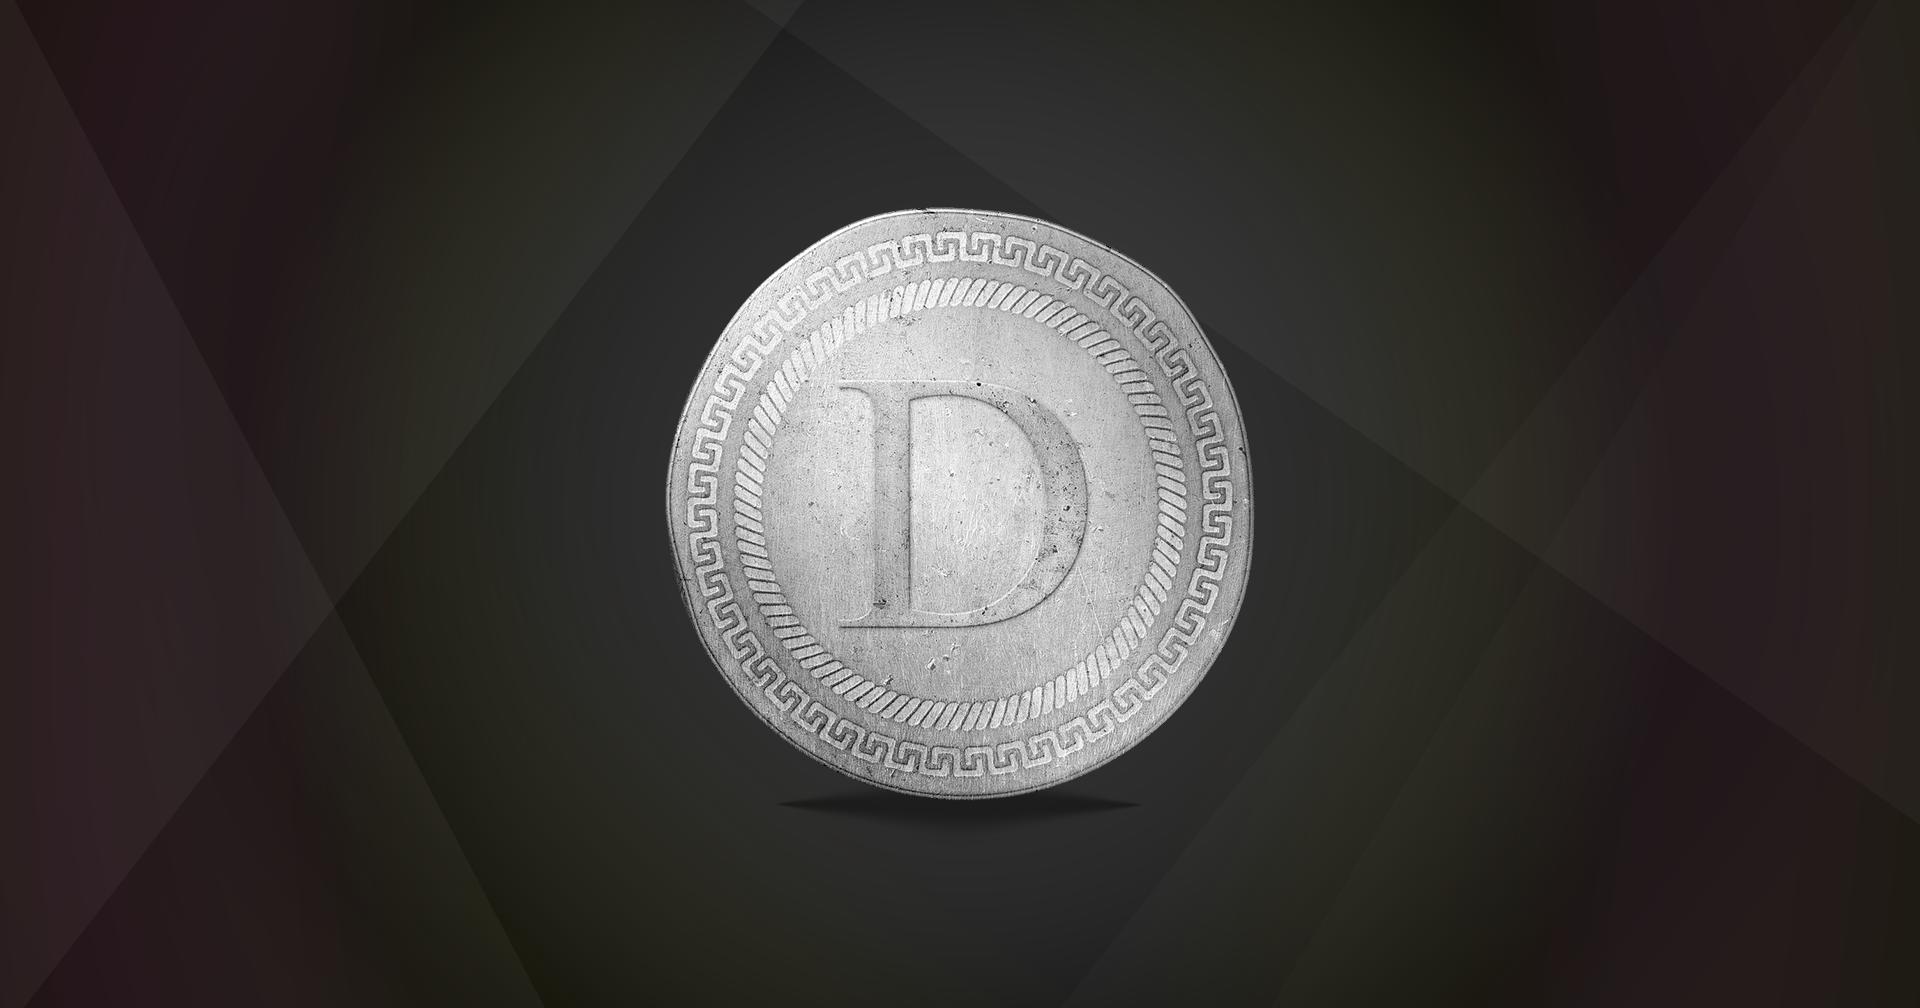 Denarius bitcoins over wolf csgo betting